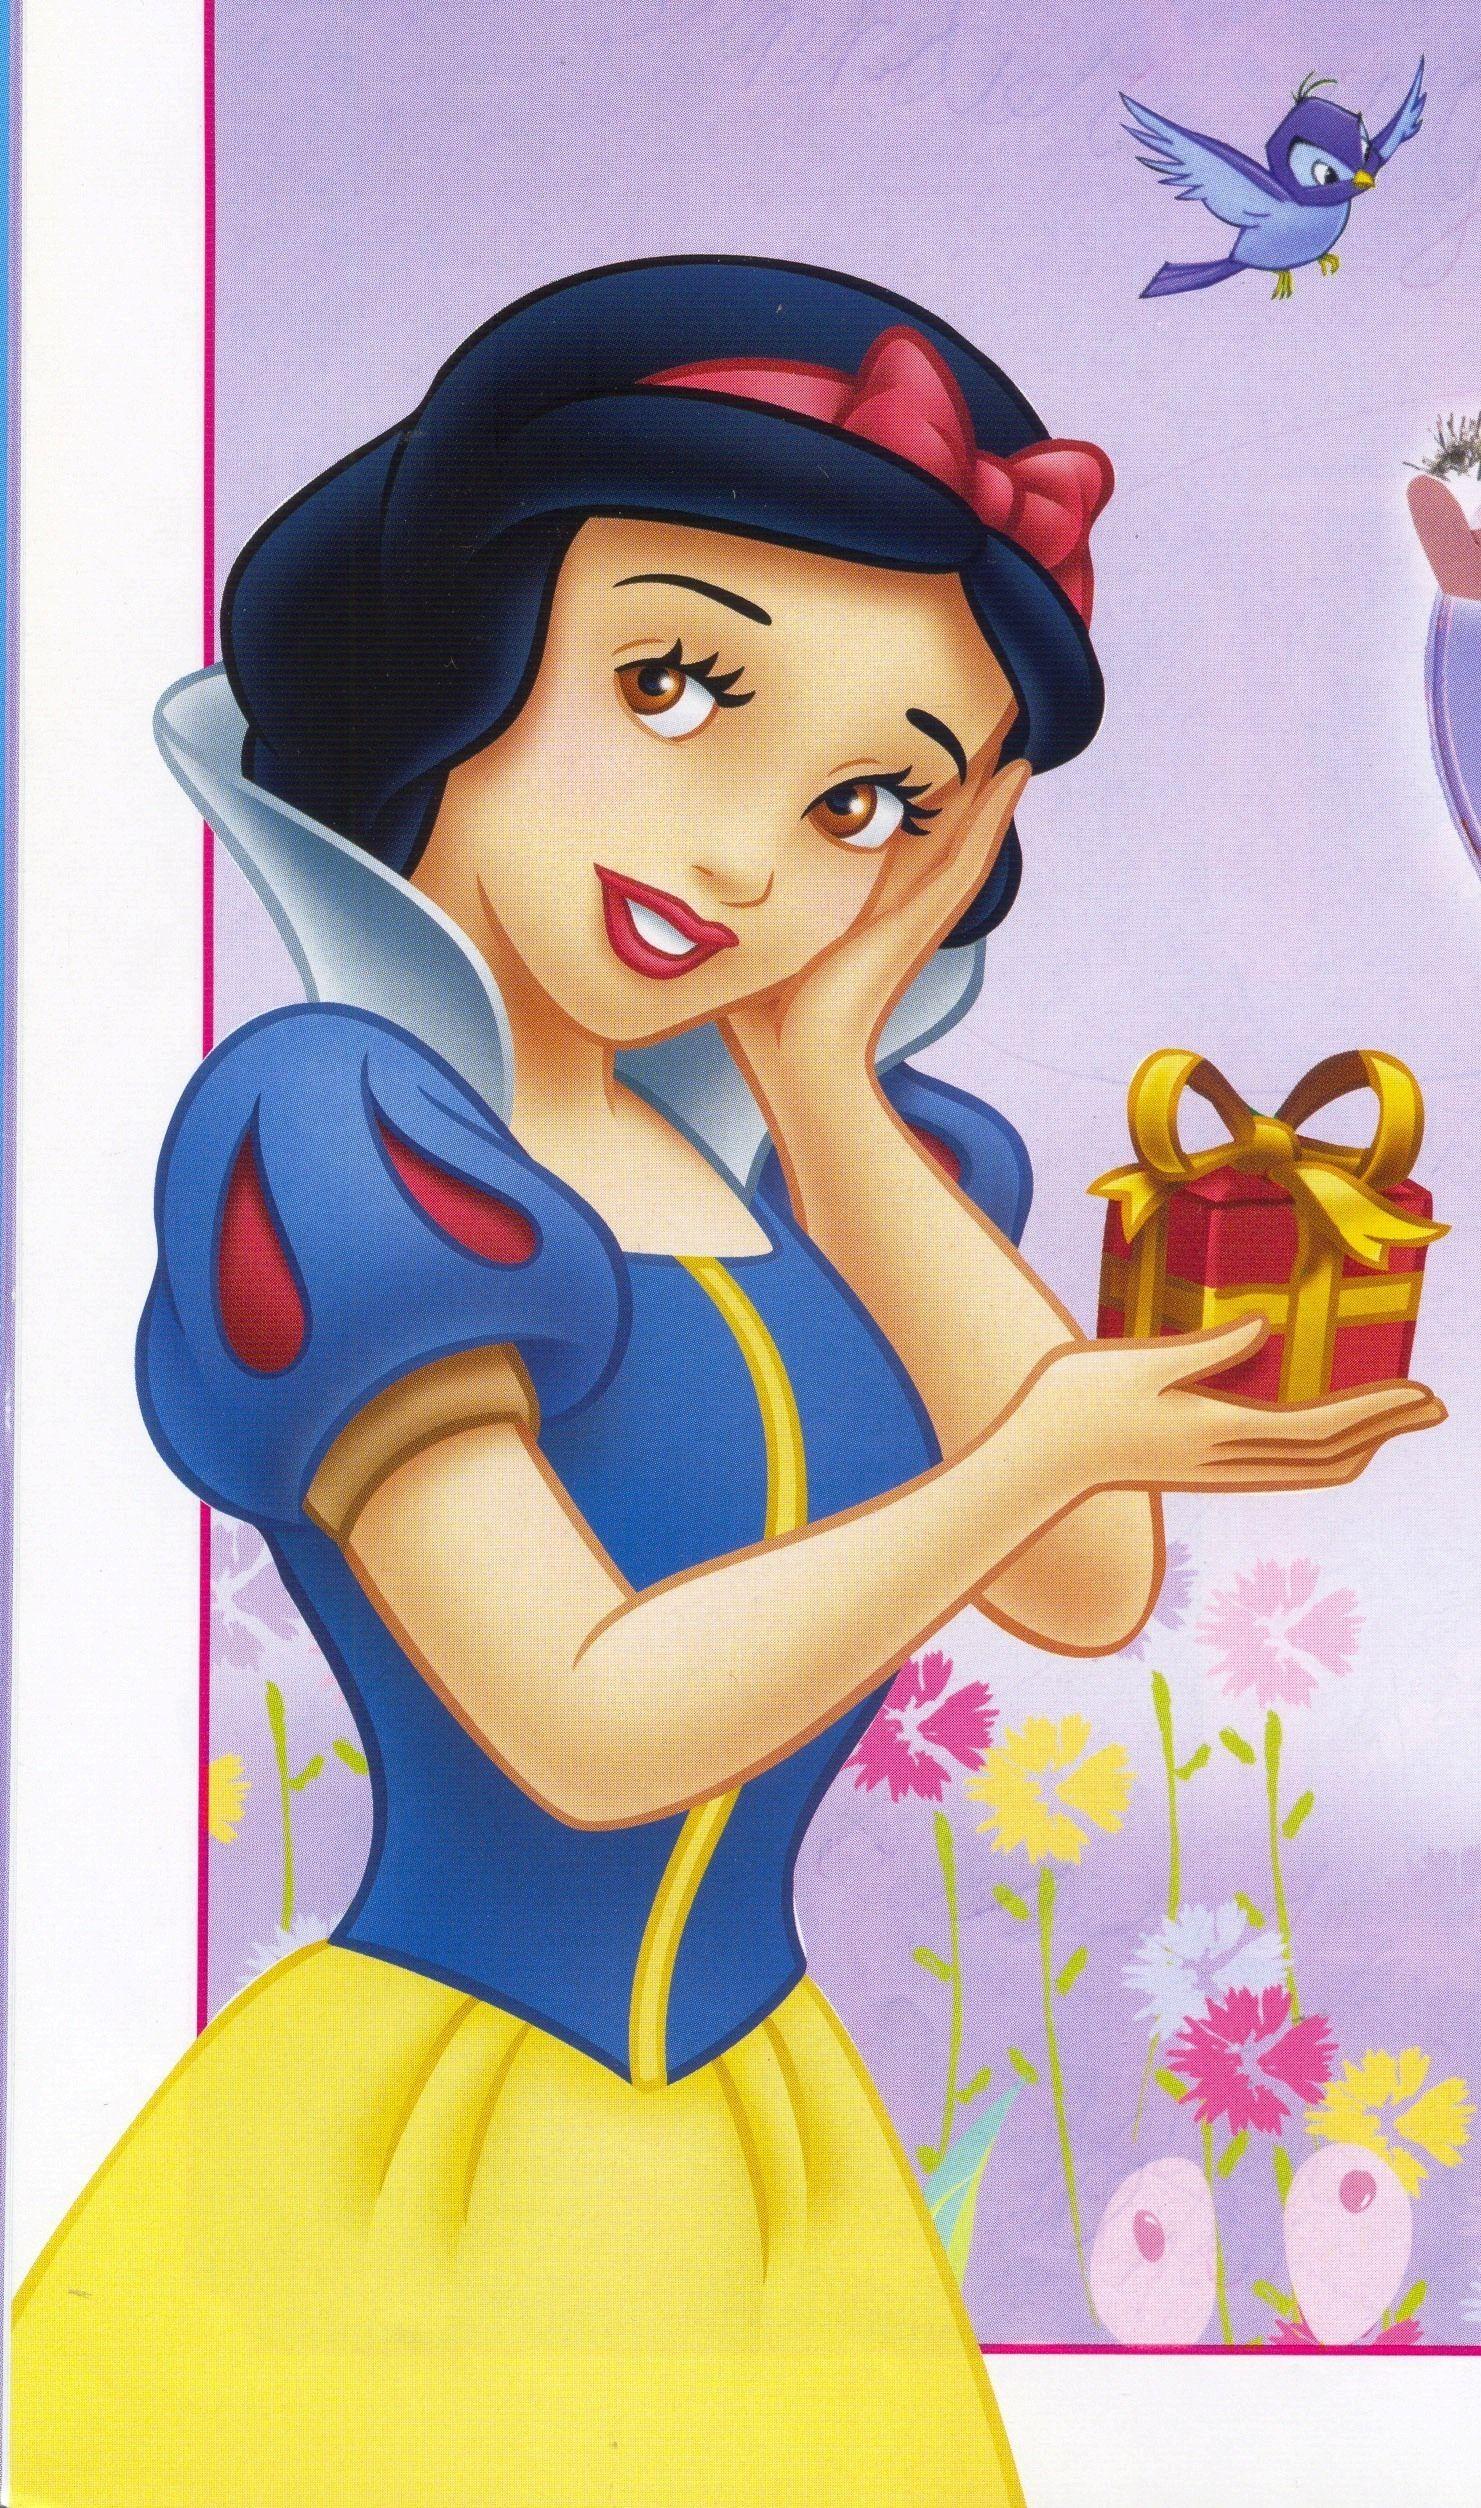 Disney Princess Snow White Description from Disney